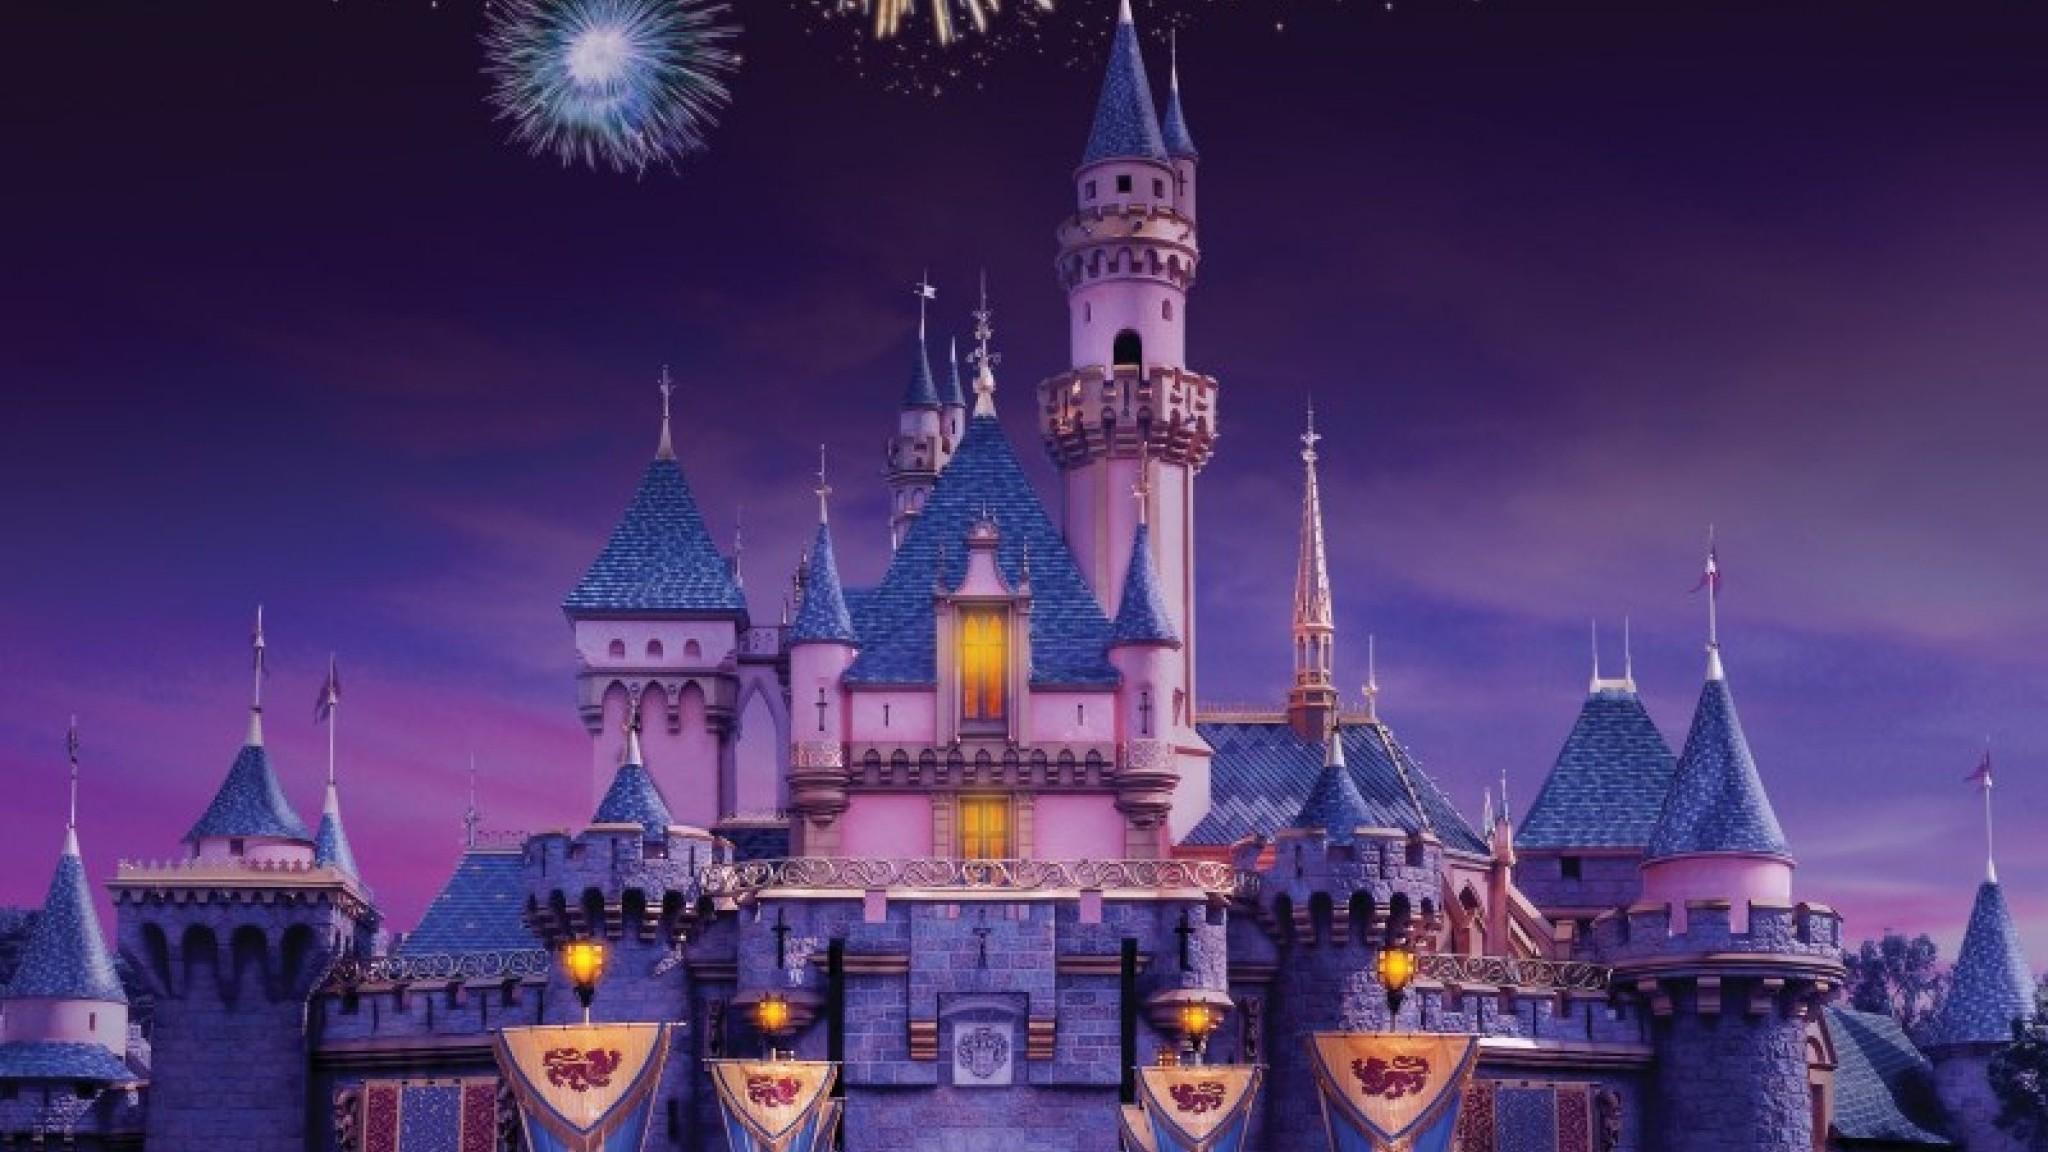 Disney World Florida Top Travel Lists Wallpaper 2048x1152 Hd Anime Images